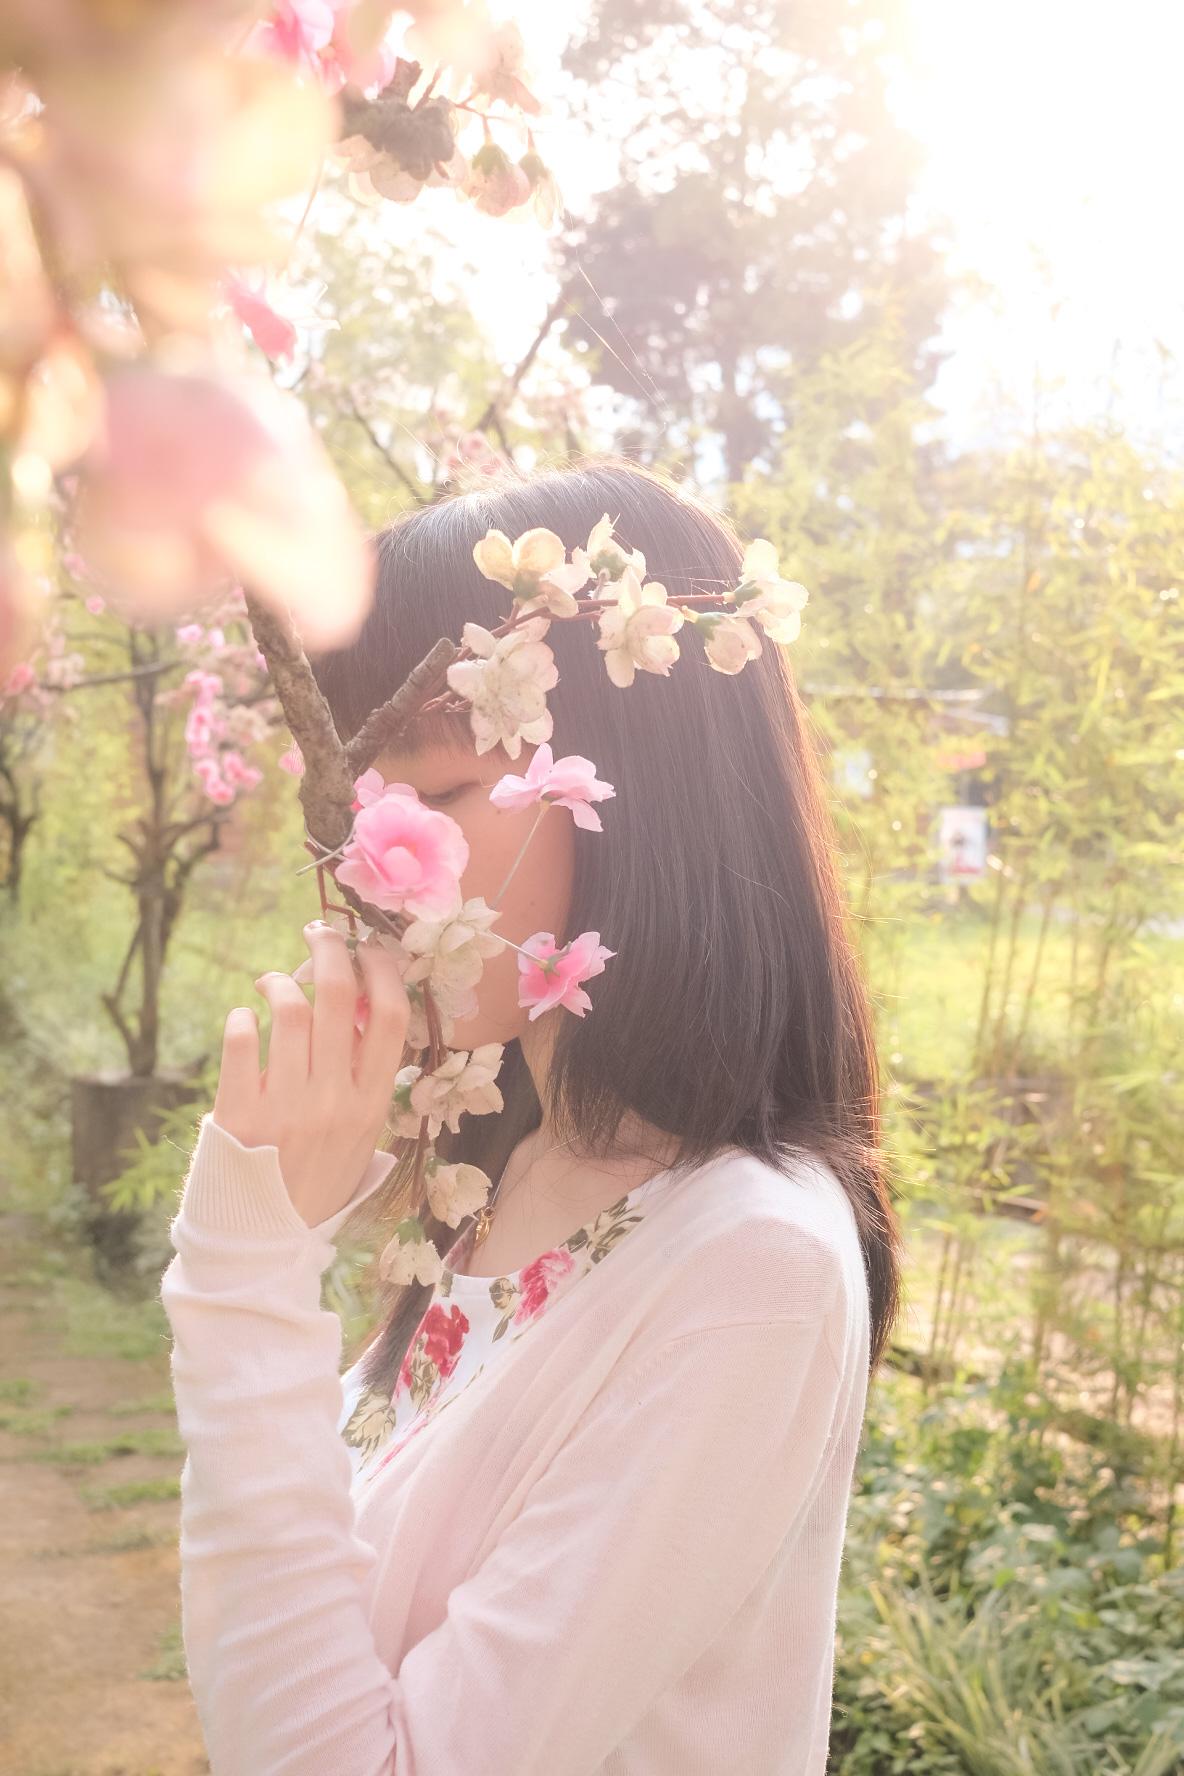 Image #1 from Yukiko